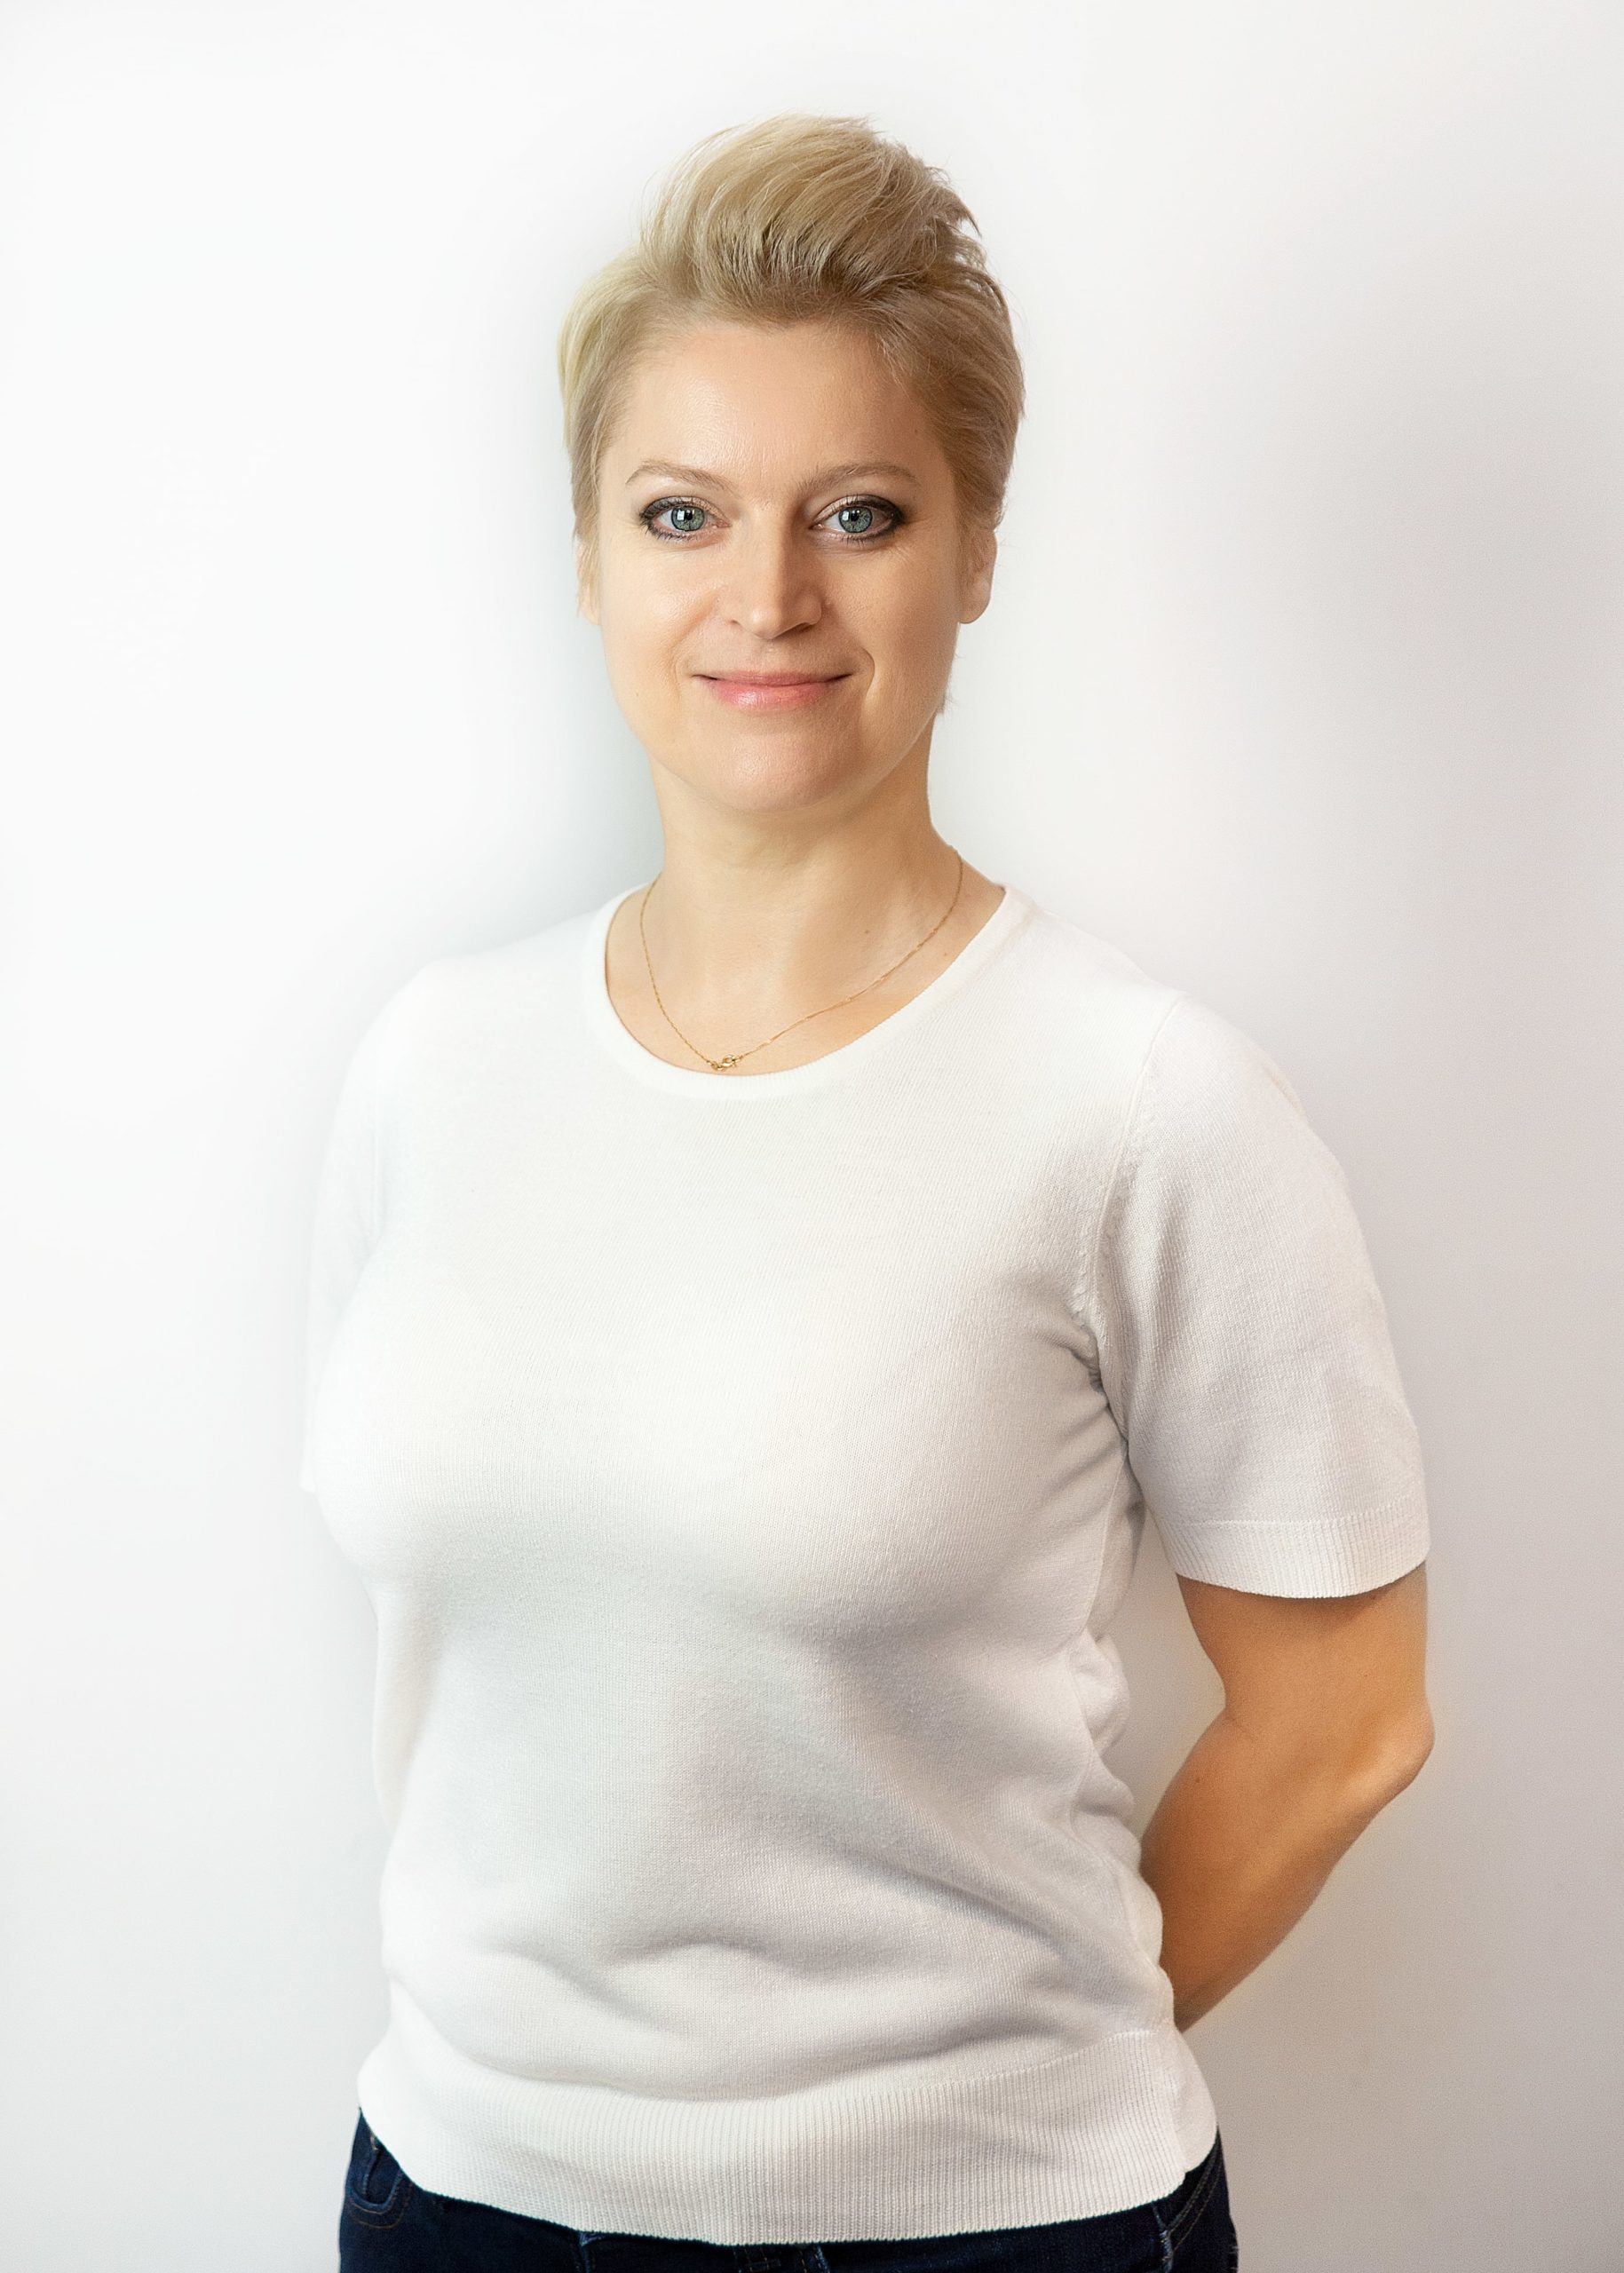 Joanna Macioł